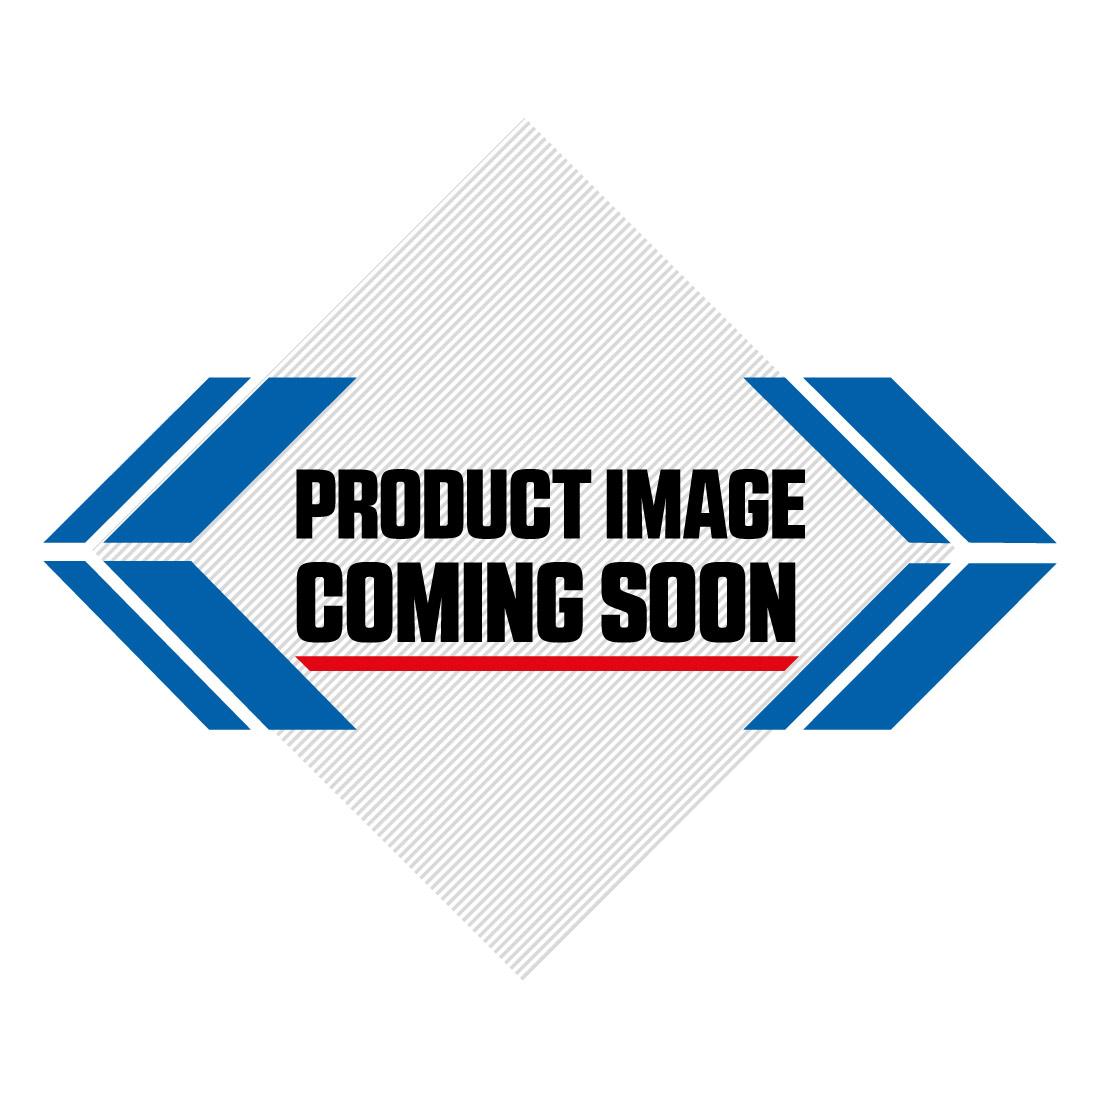 Renthal Twinring Rear Sprocket KTM SX SX-F EXC EXC-F Husqvarna TC FC TE FE - Black Image-3>